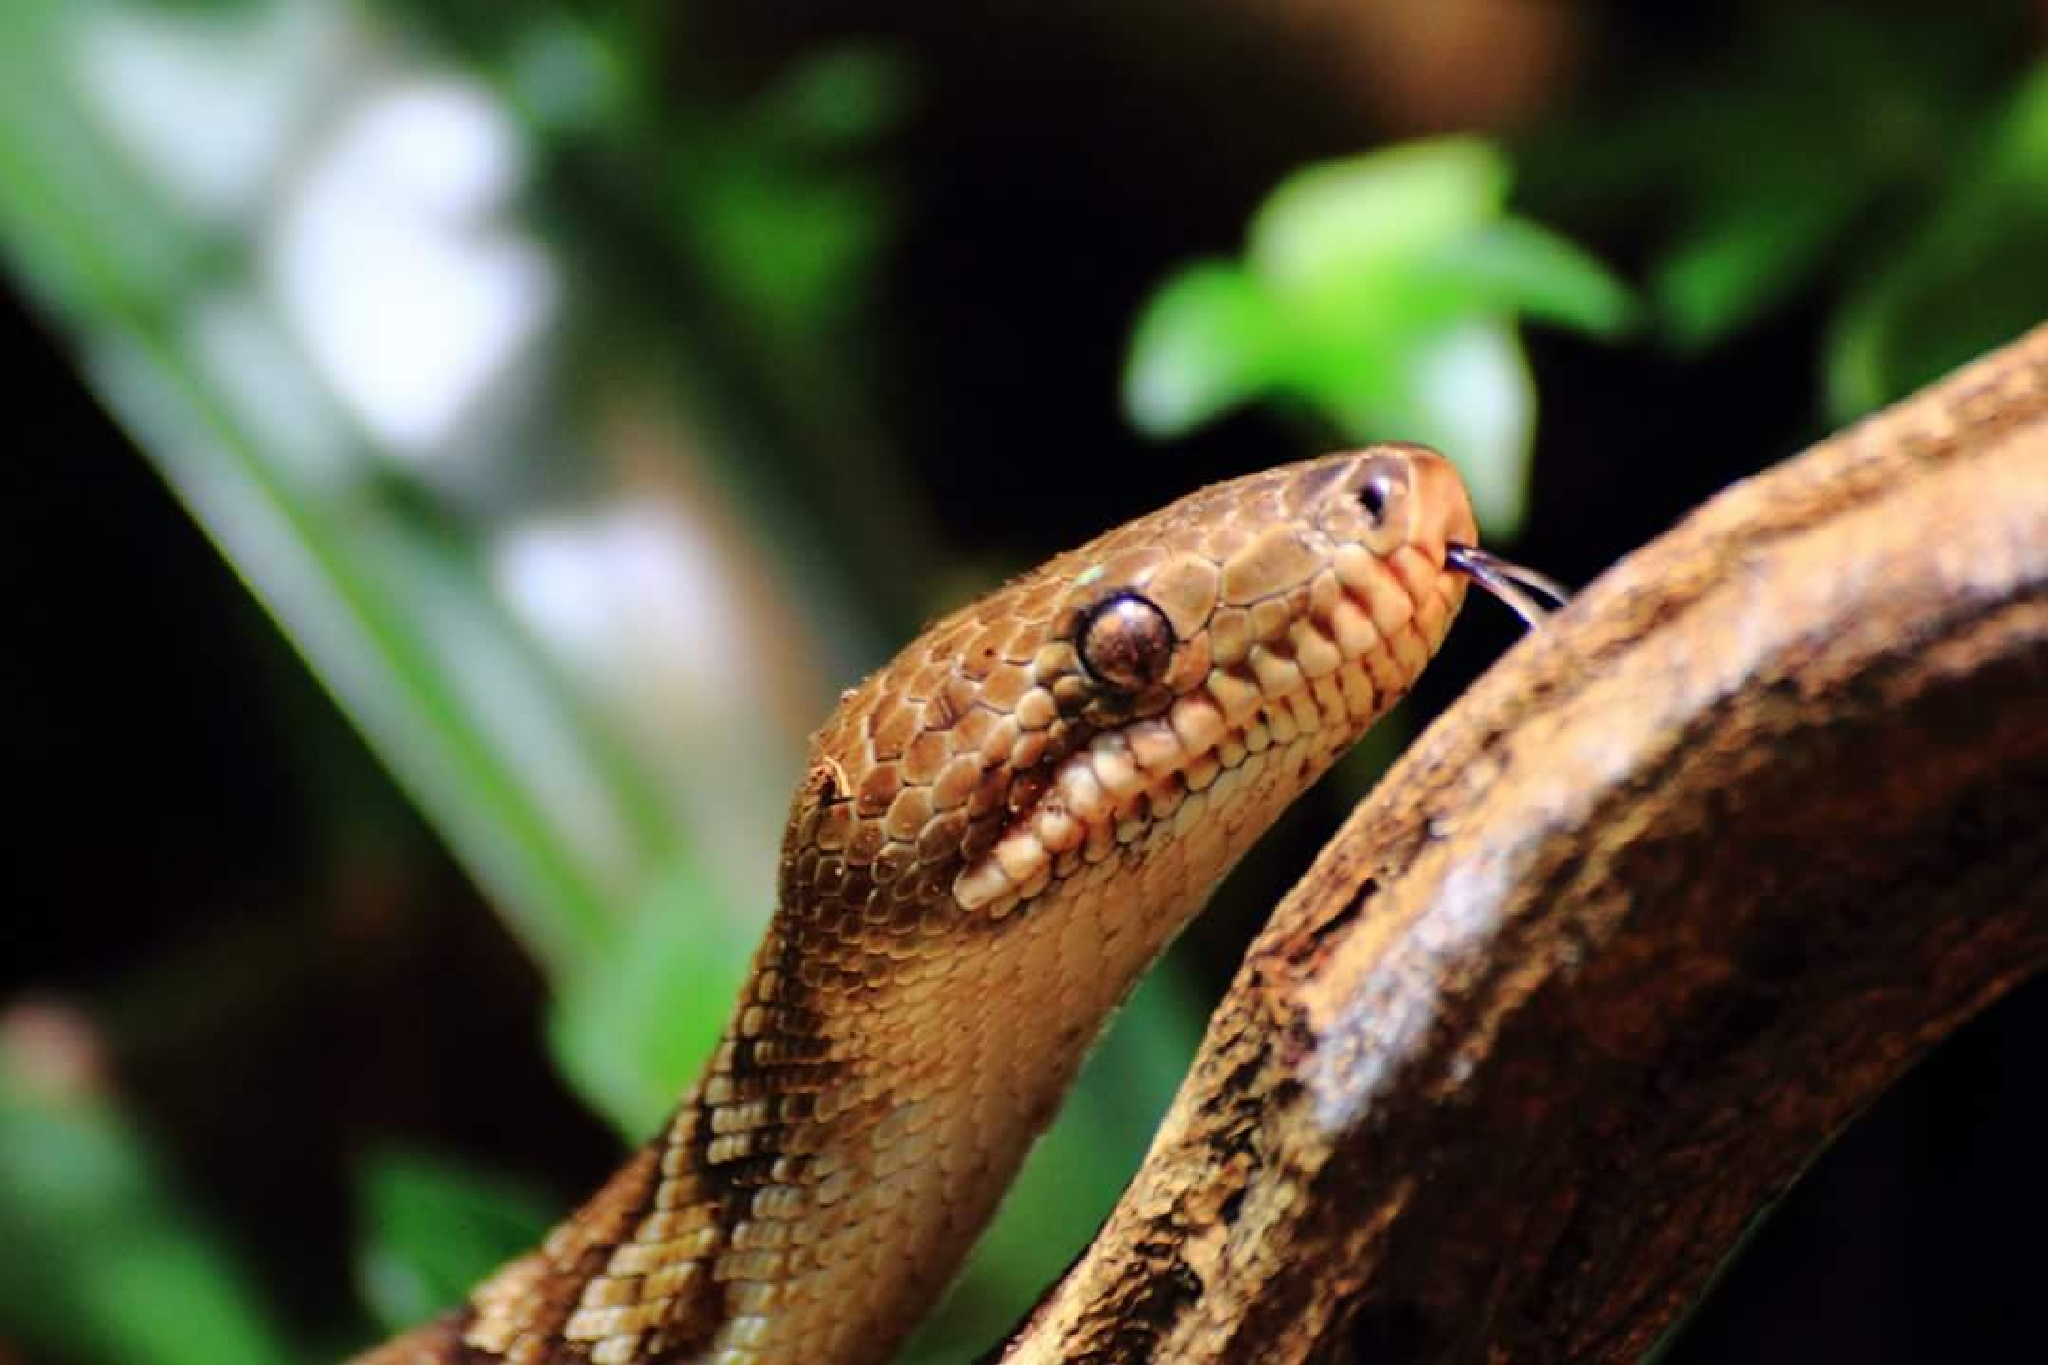 Snake by Steve Flanagan